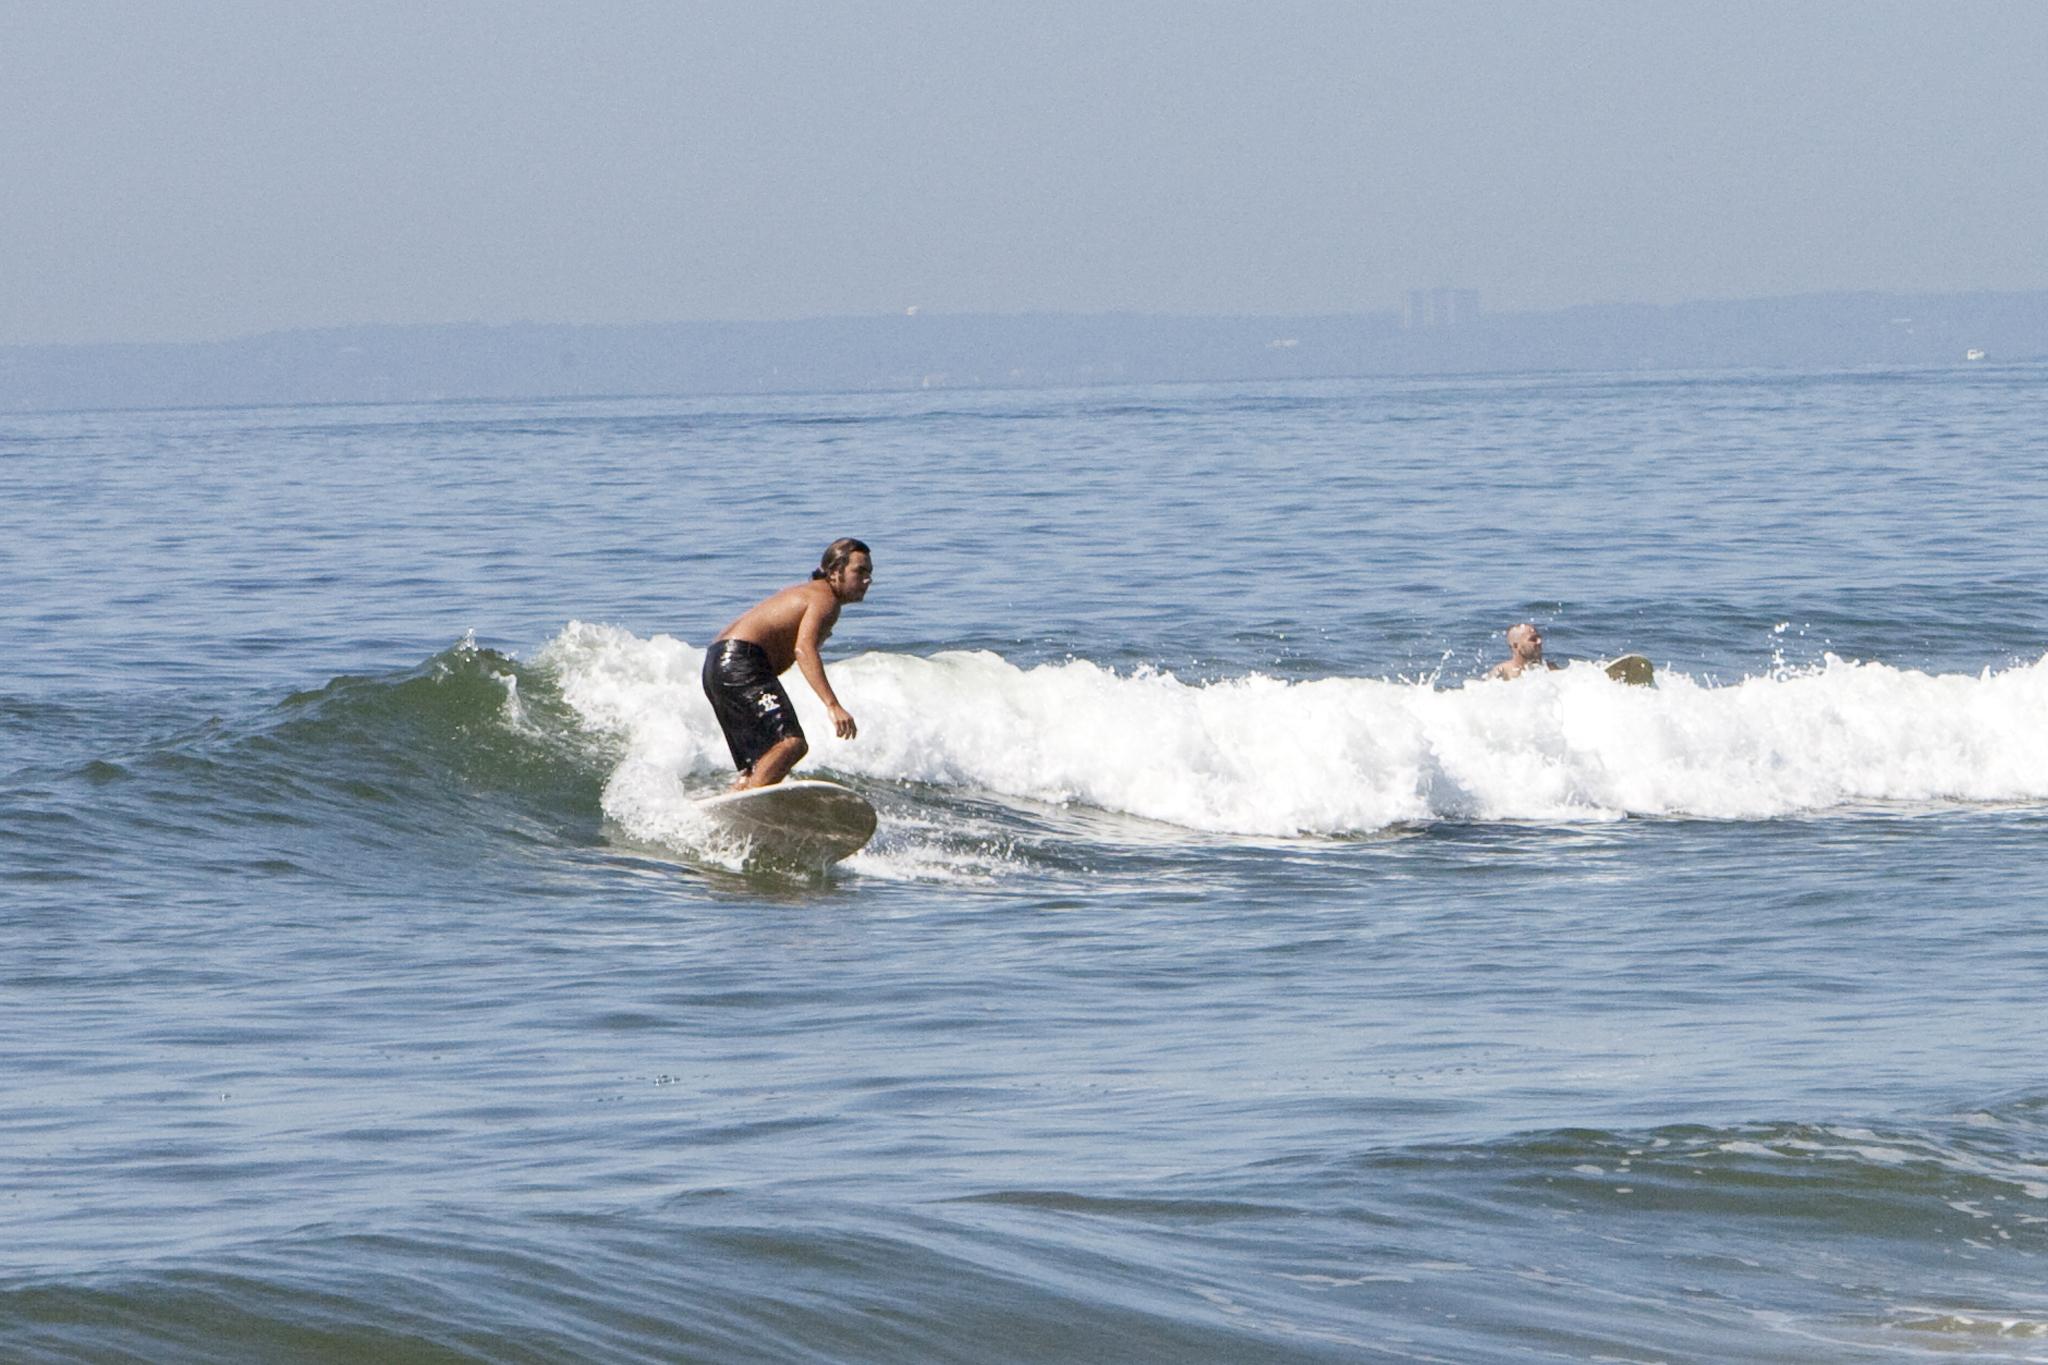 Surfing at Rockaway